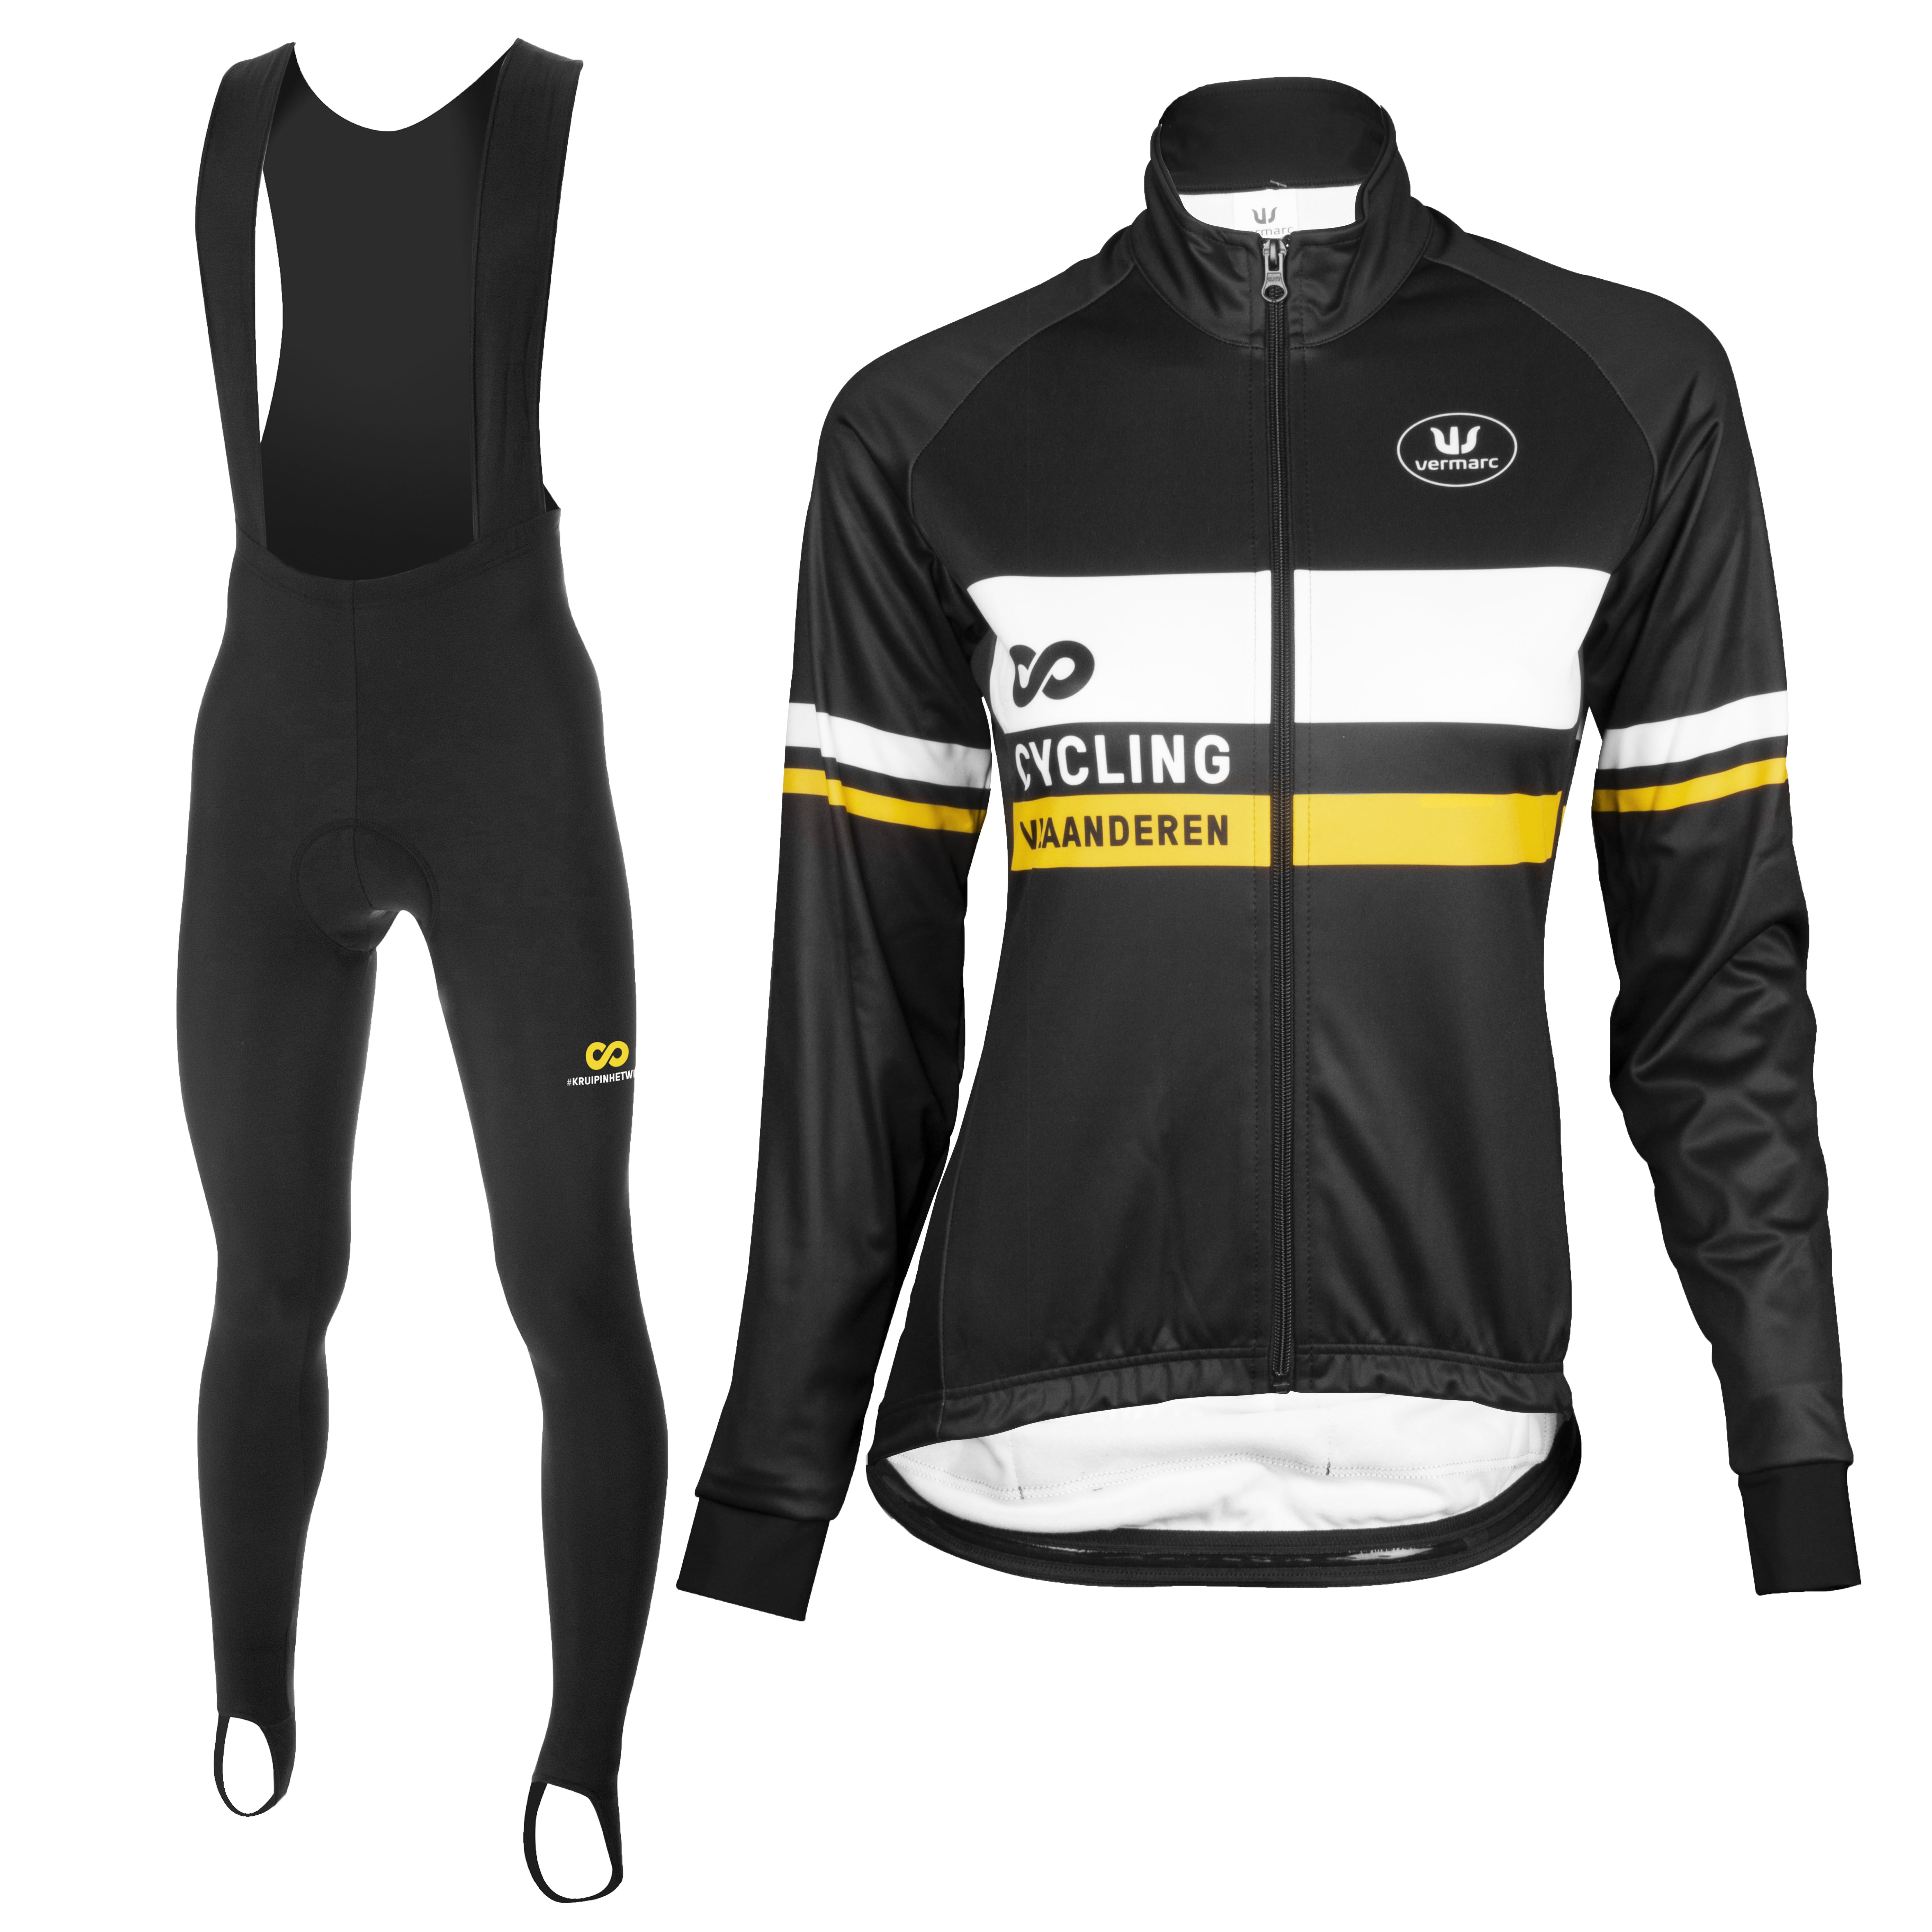 Cyclisme Vlaanderen Paquet Hiver